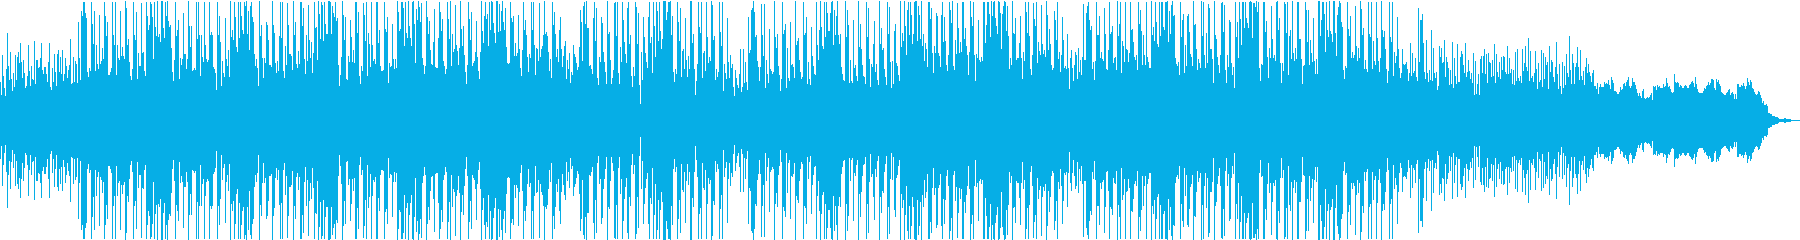 seekenserの再生済みの波形